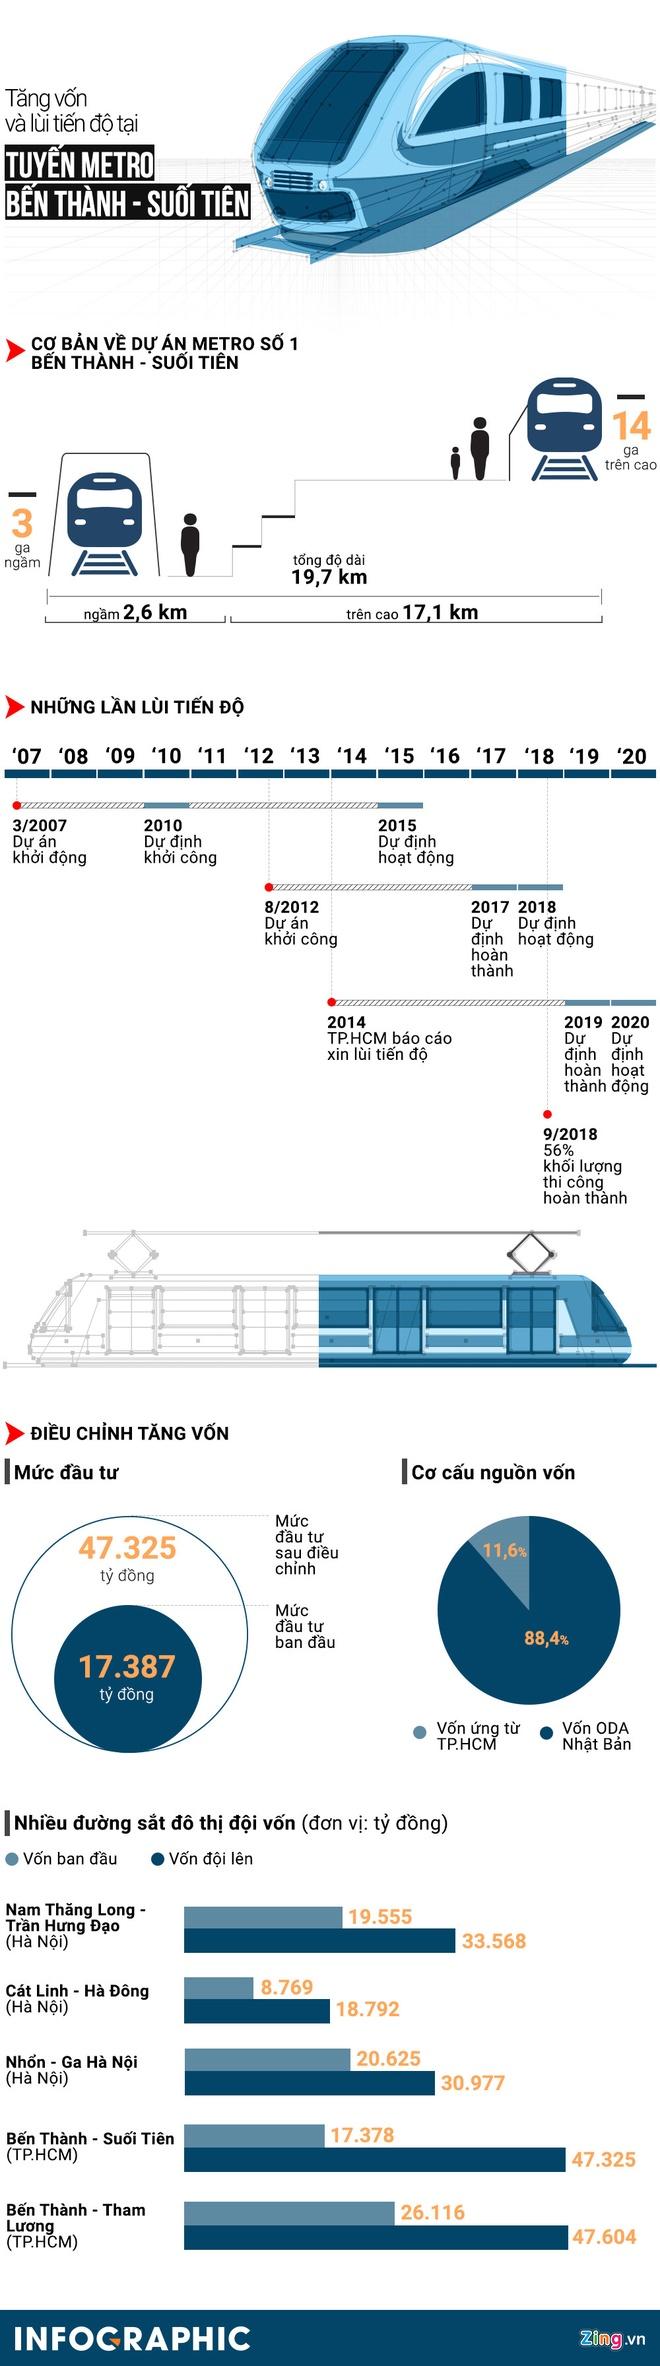 Kien nghi tam ung 2.158 ty dong cho du an metro so 1 trong thang 2 hinh anh 2